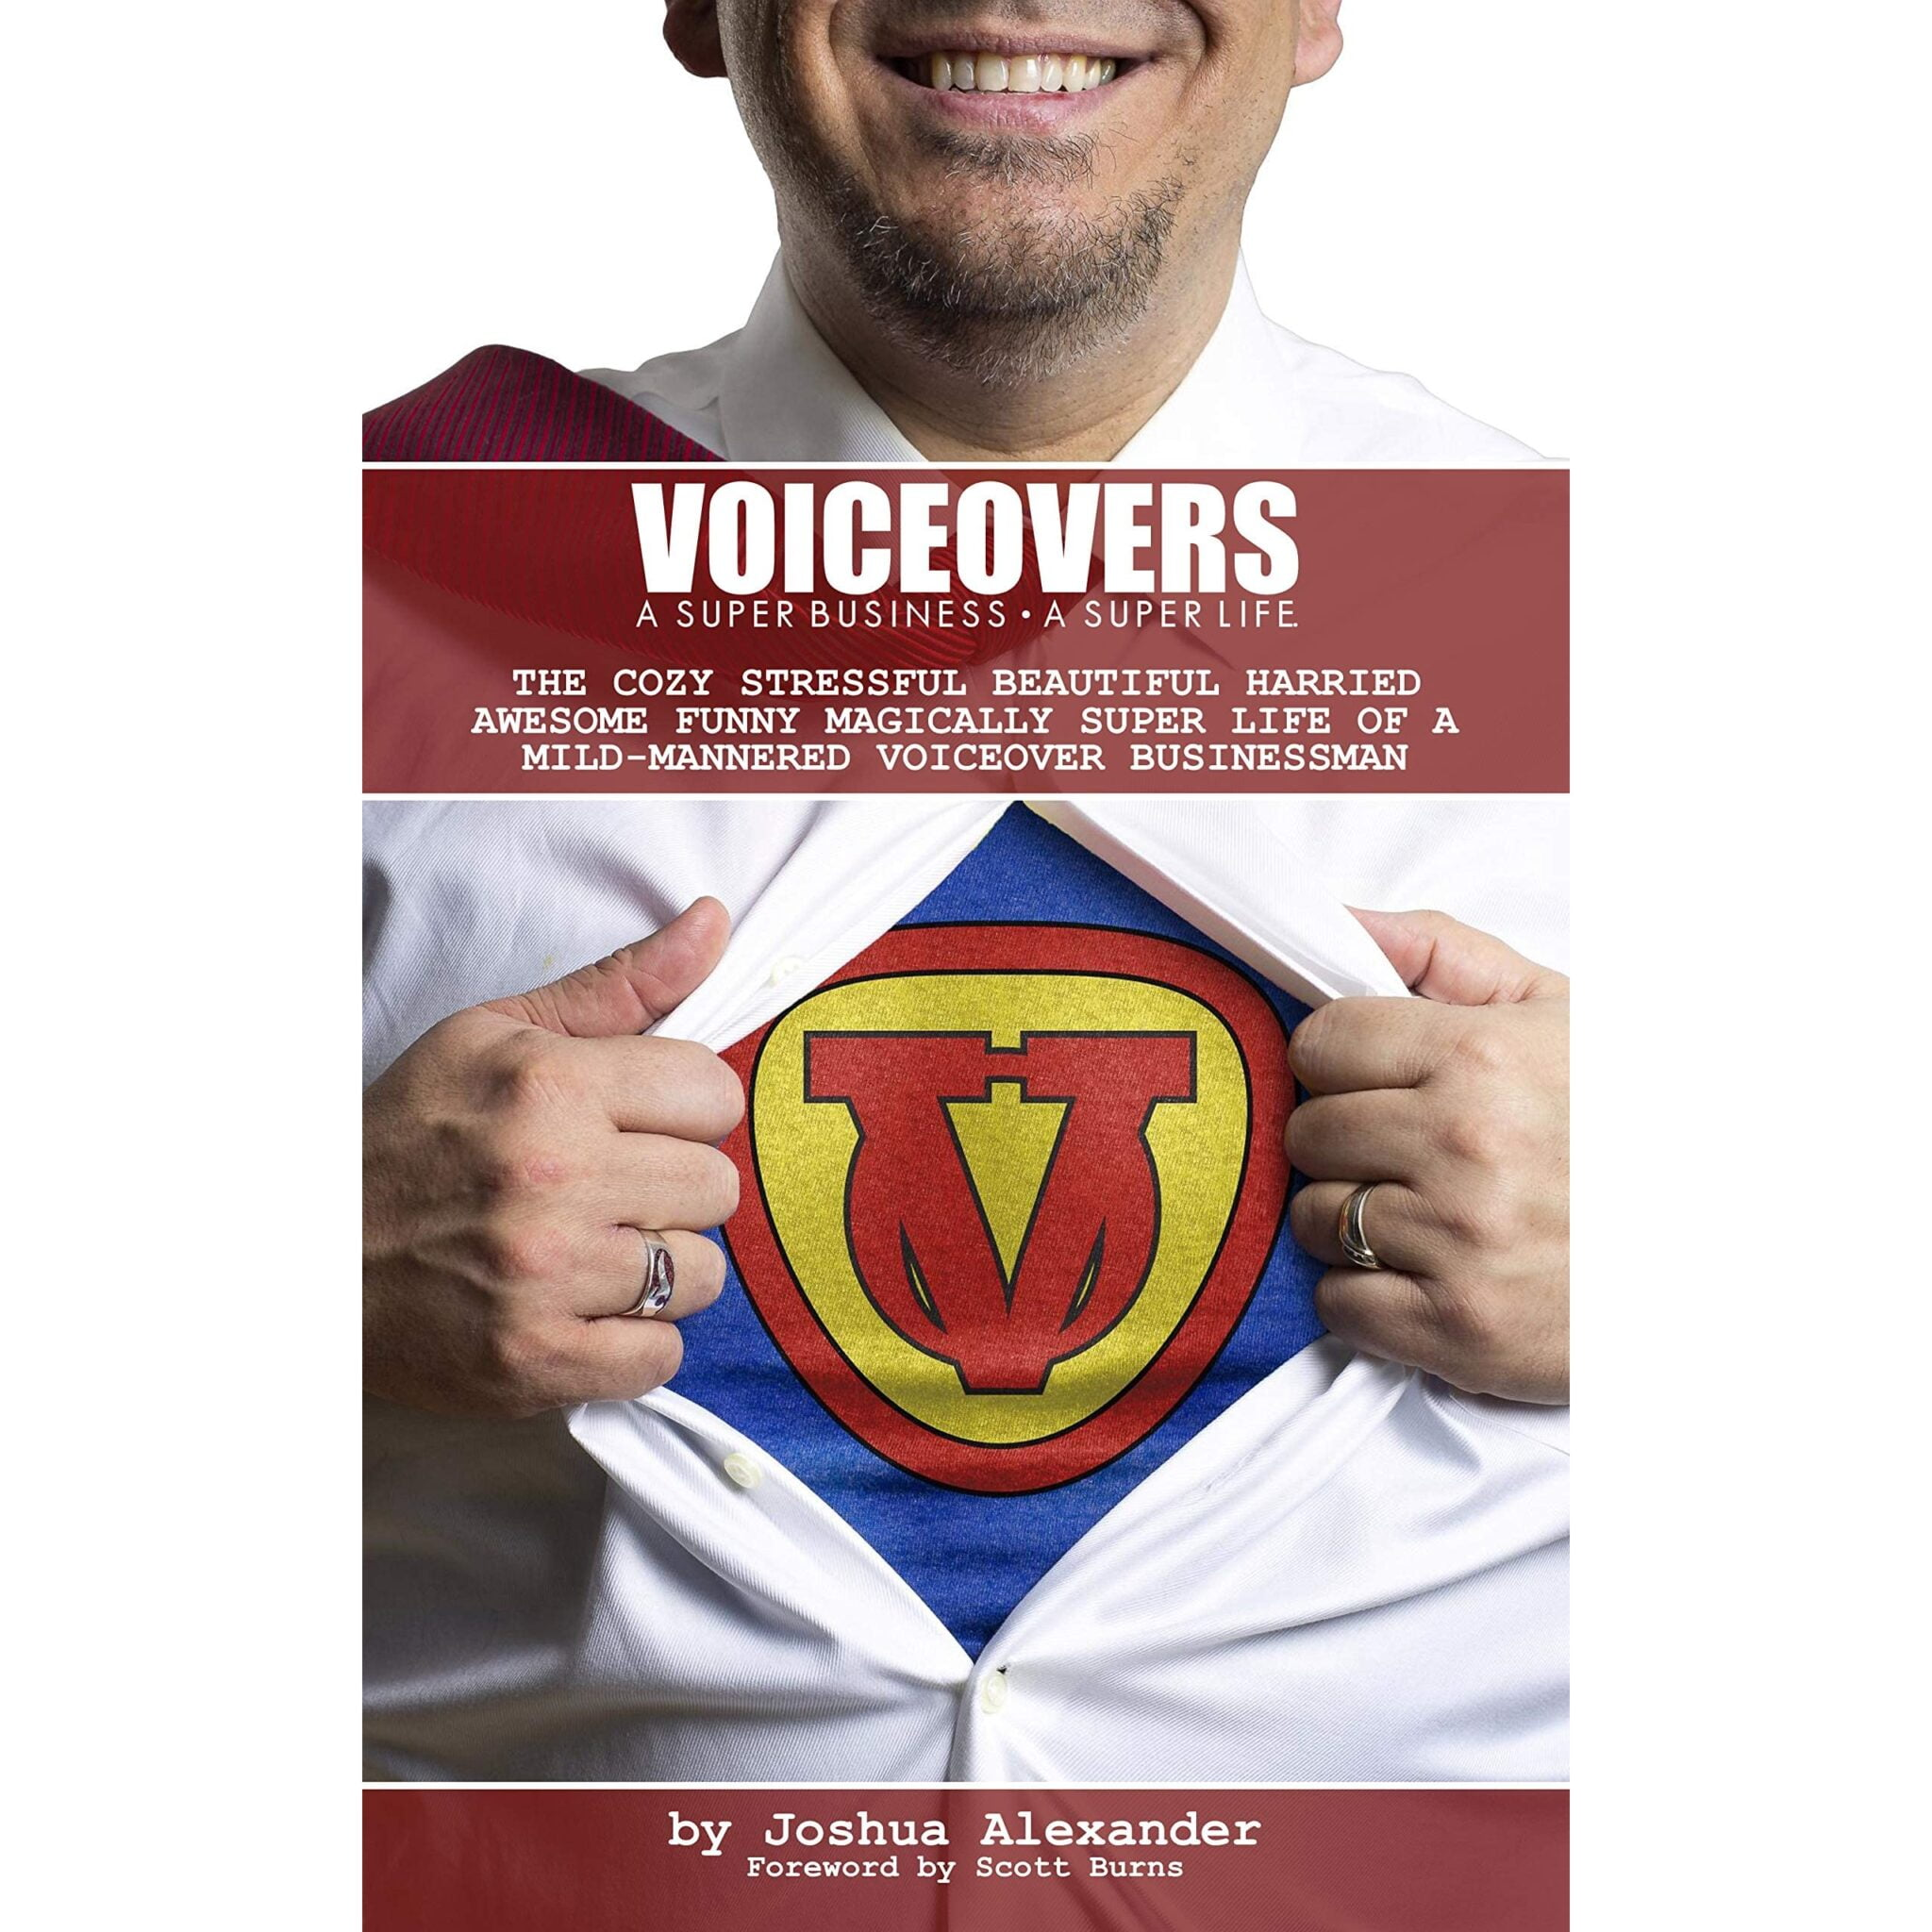 joshua alexander voiceovers book